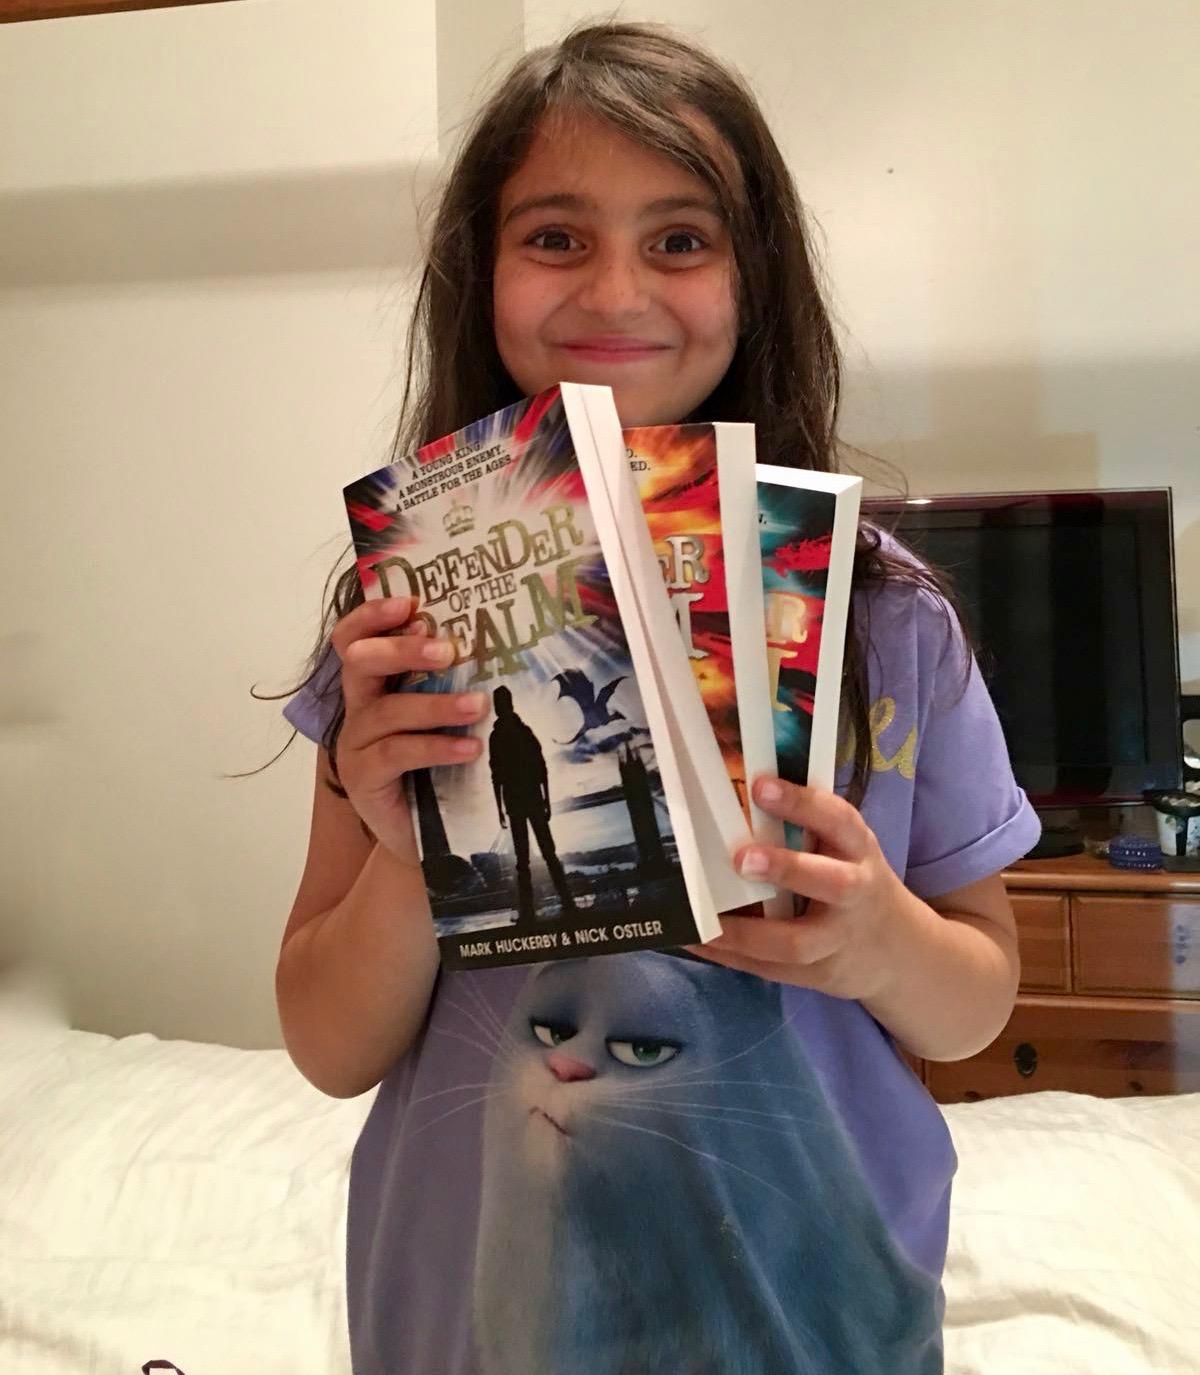 Bookwagon Defender trilogy